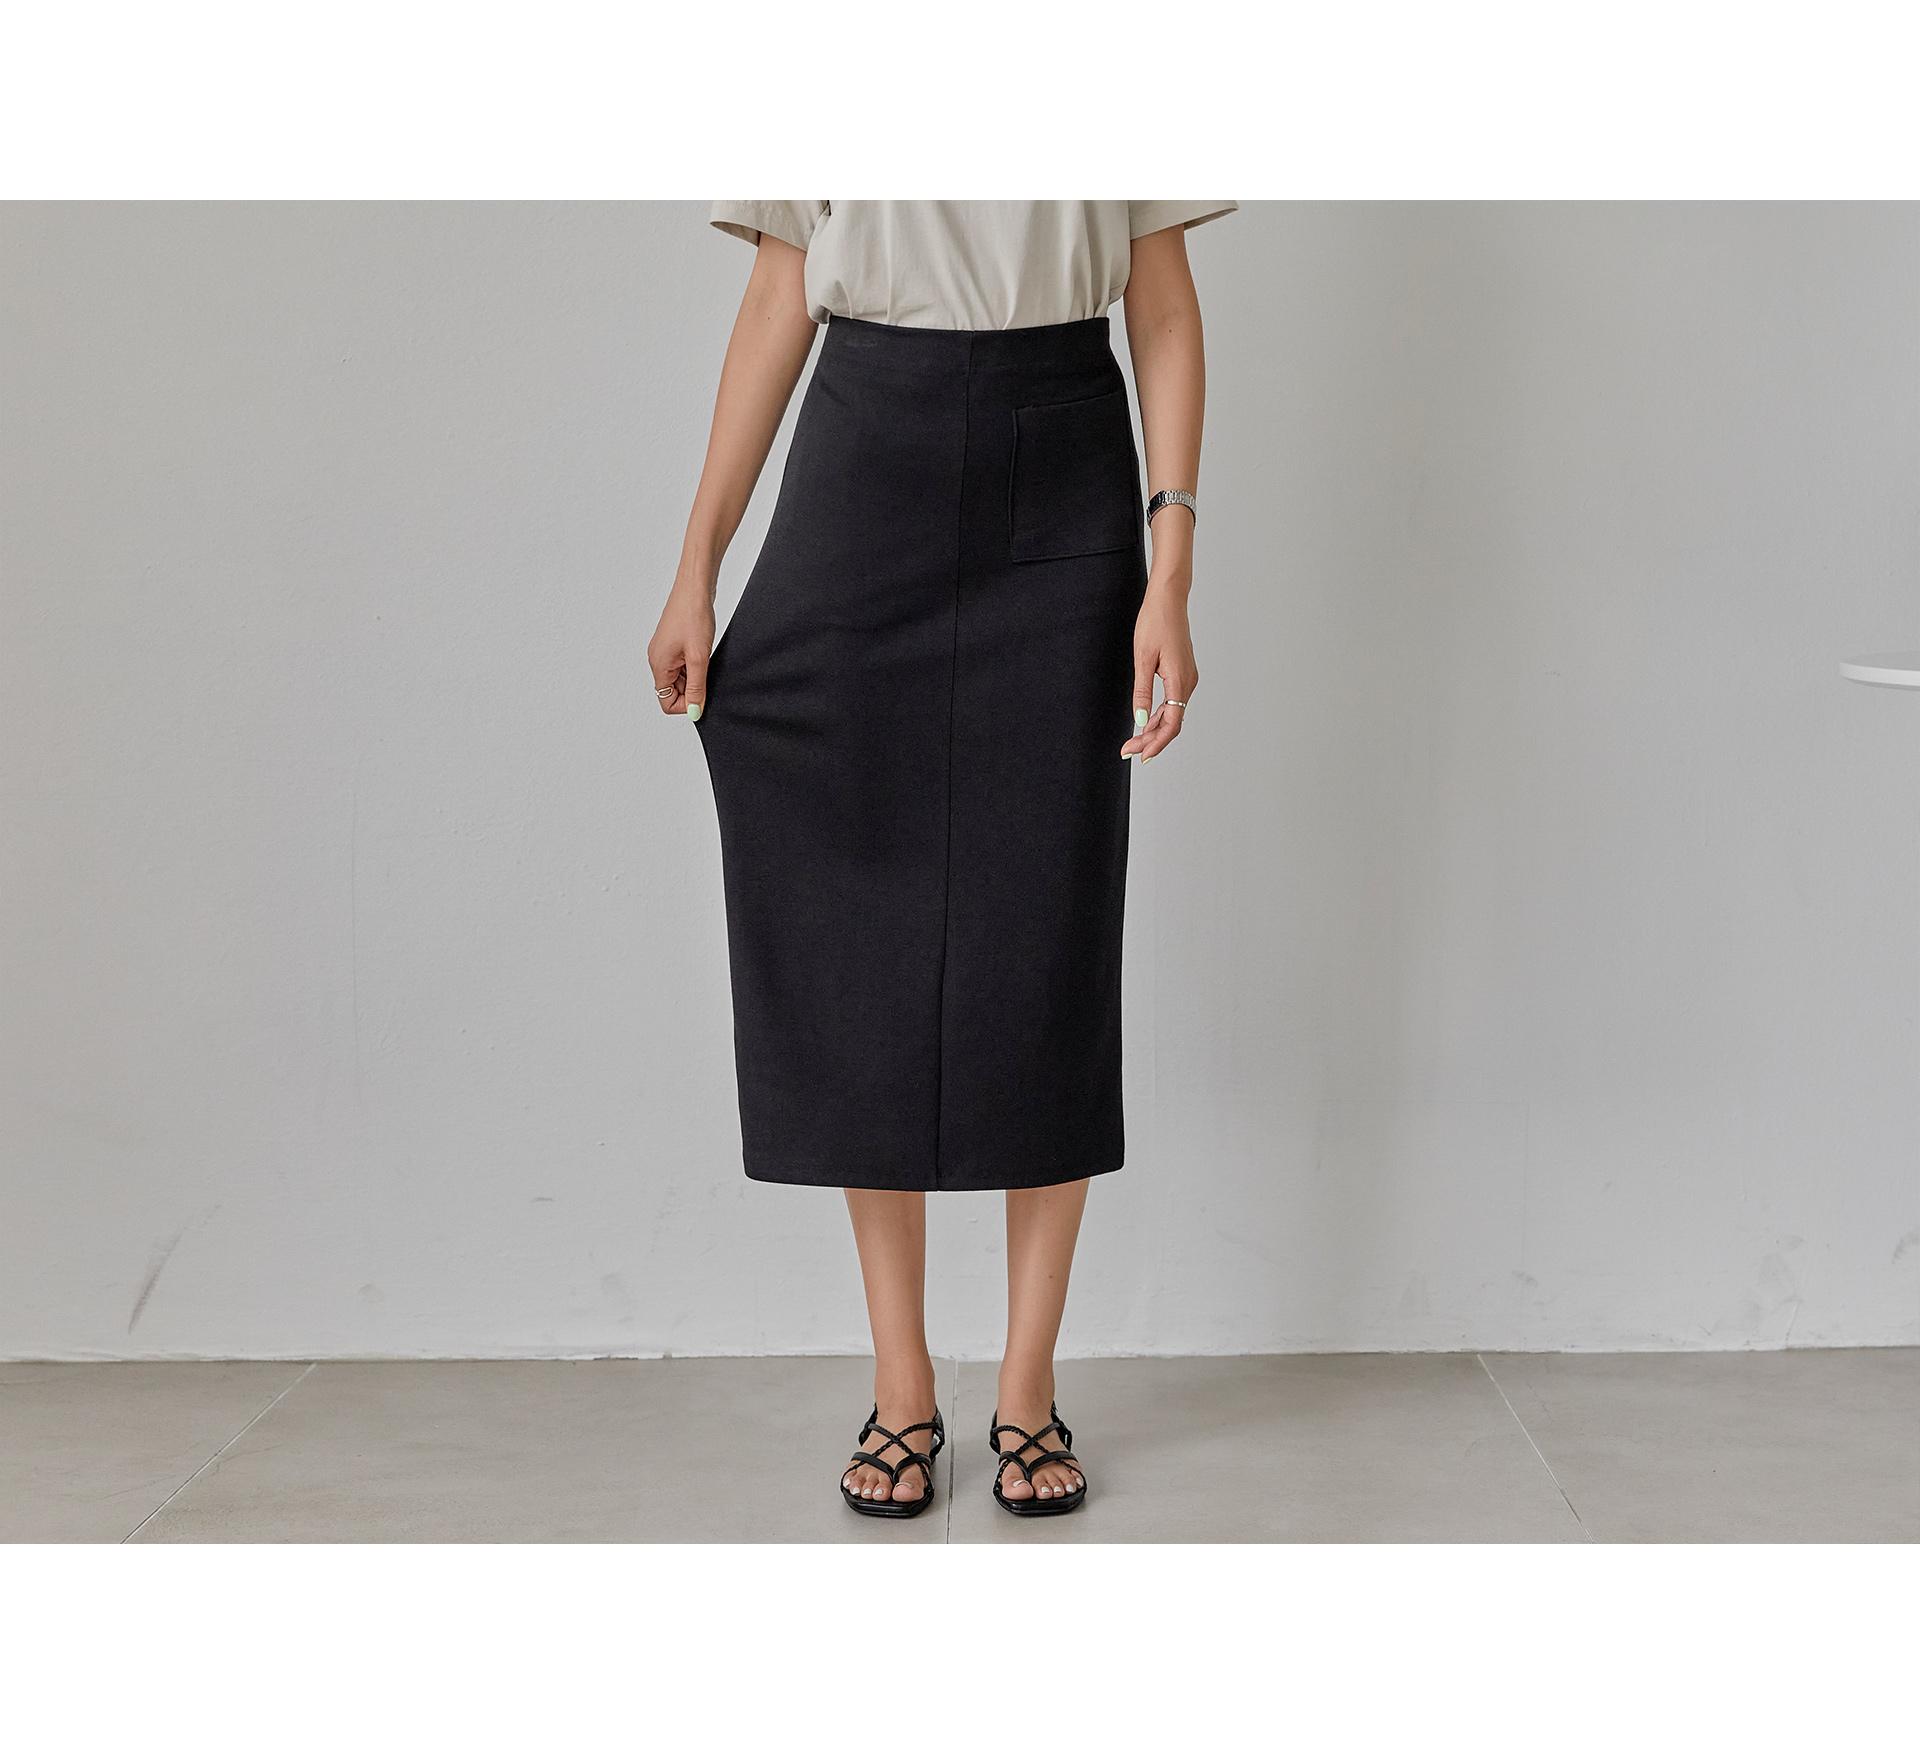 Twisted Banding Pudding Skirt #51258